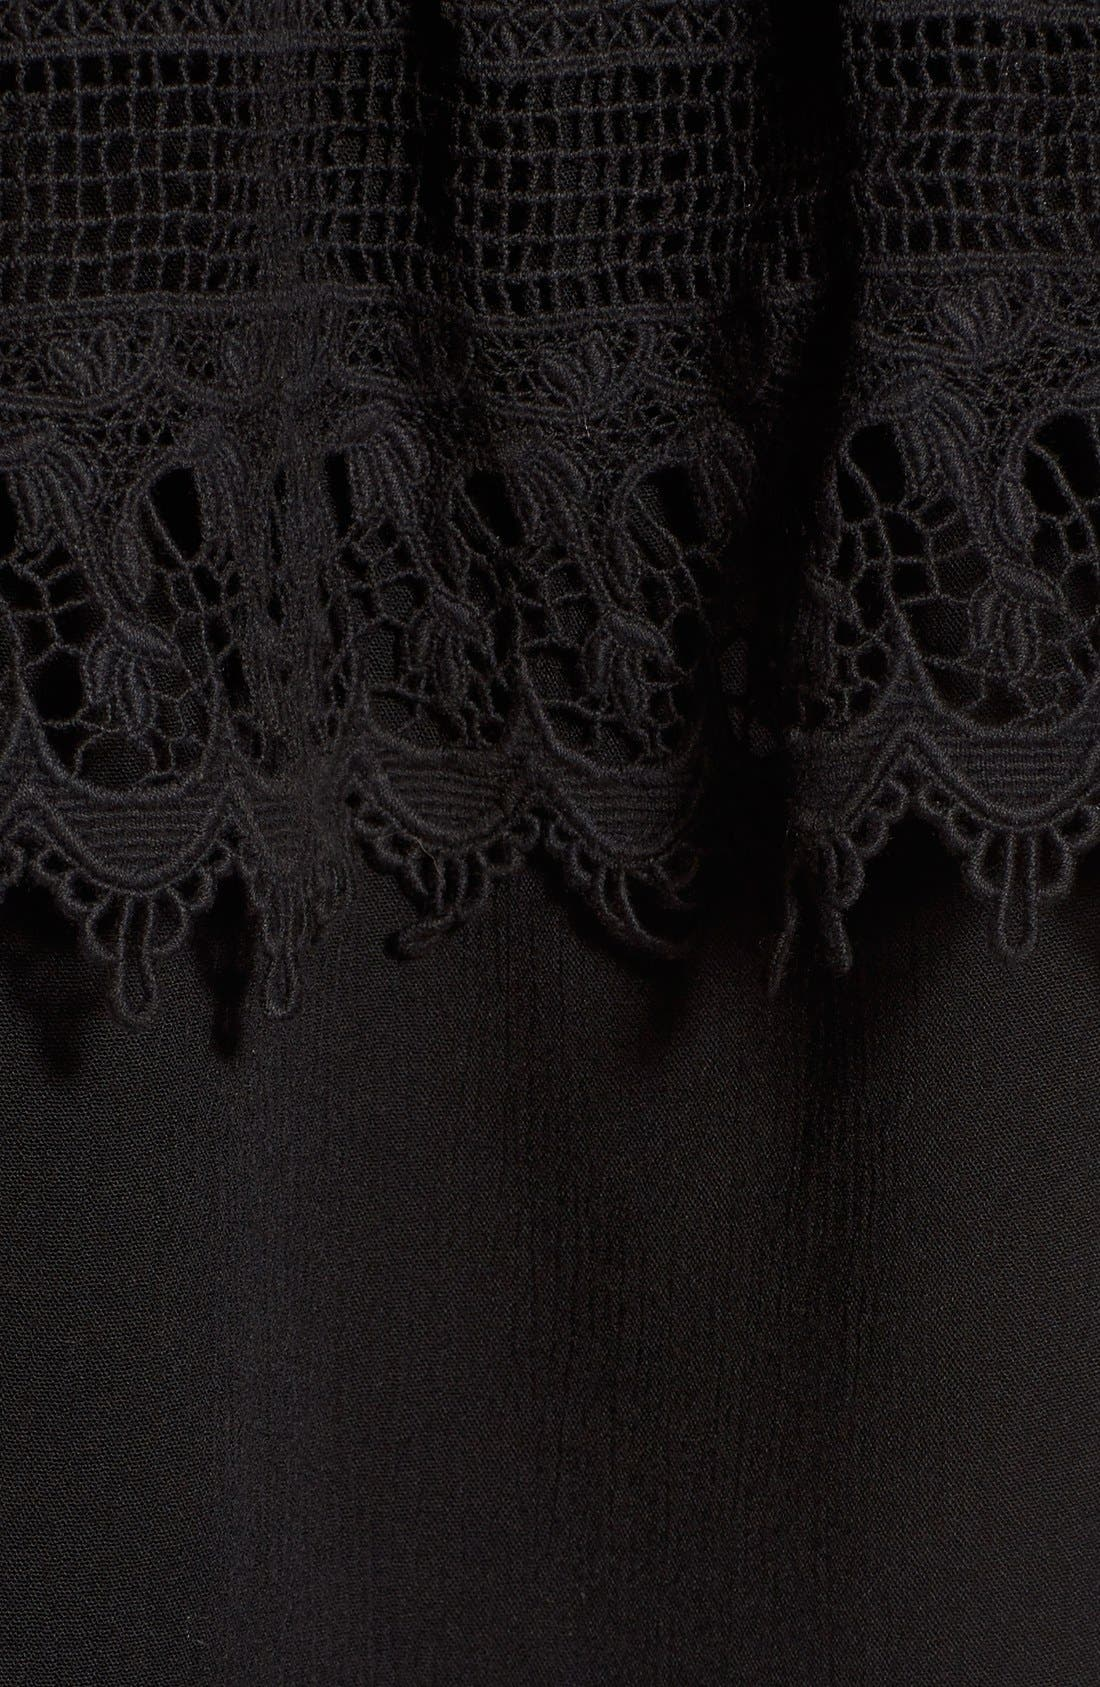 SOCIALITE, Crochet Off the Shoulder Top, Alternate thumbnail 2, color, 005